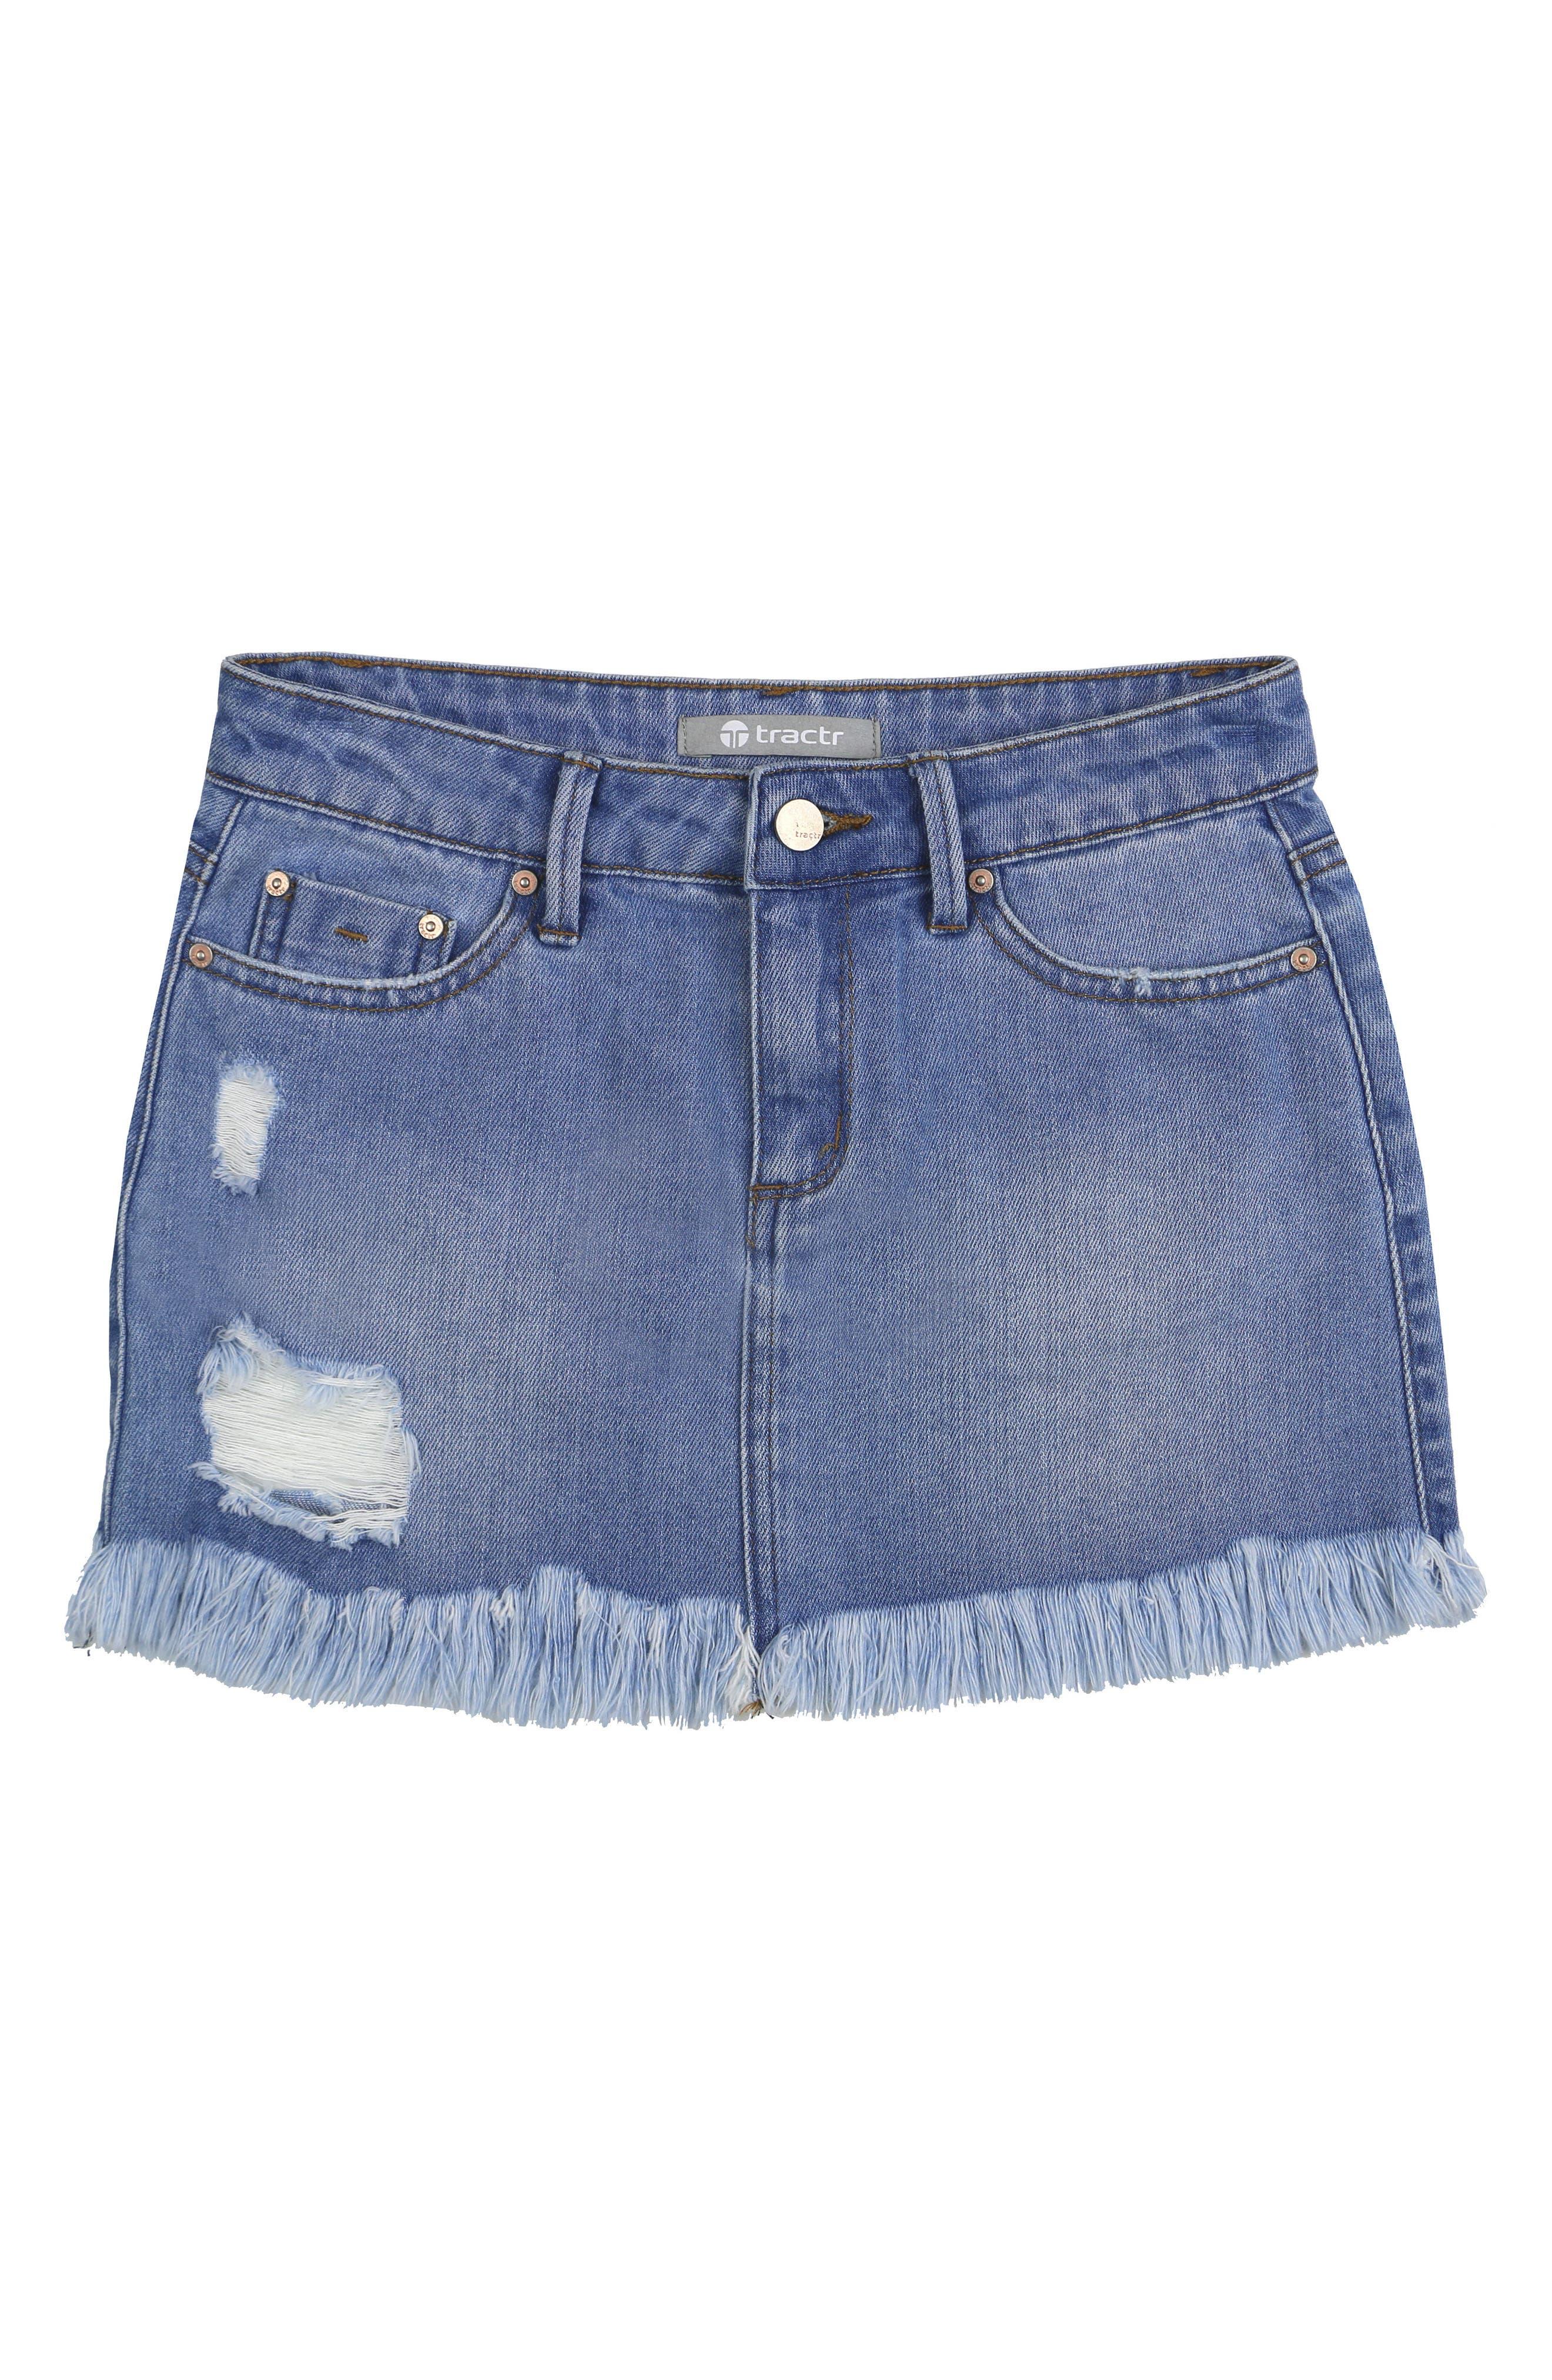 Main Image - Tractr Distressed Denim Skirt (Big Girls)